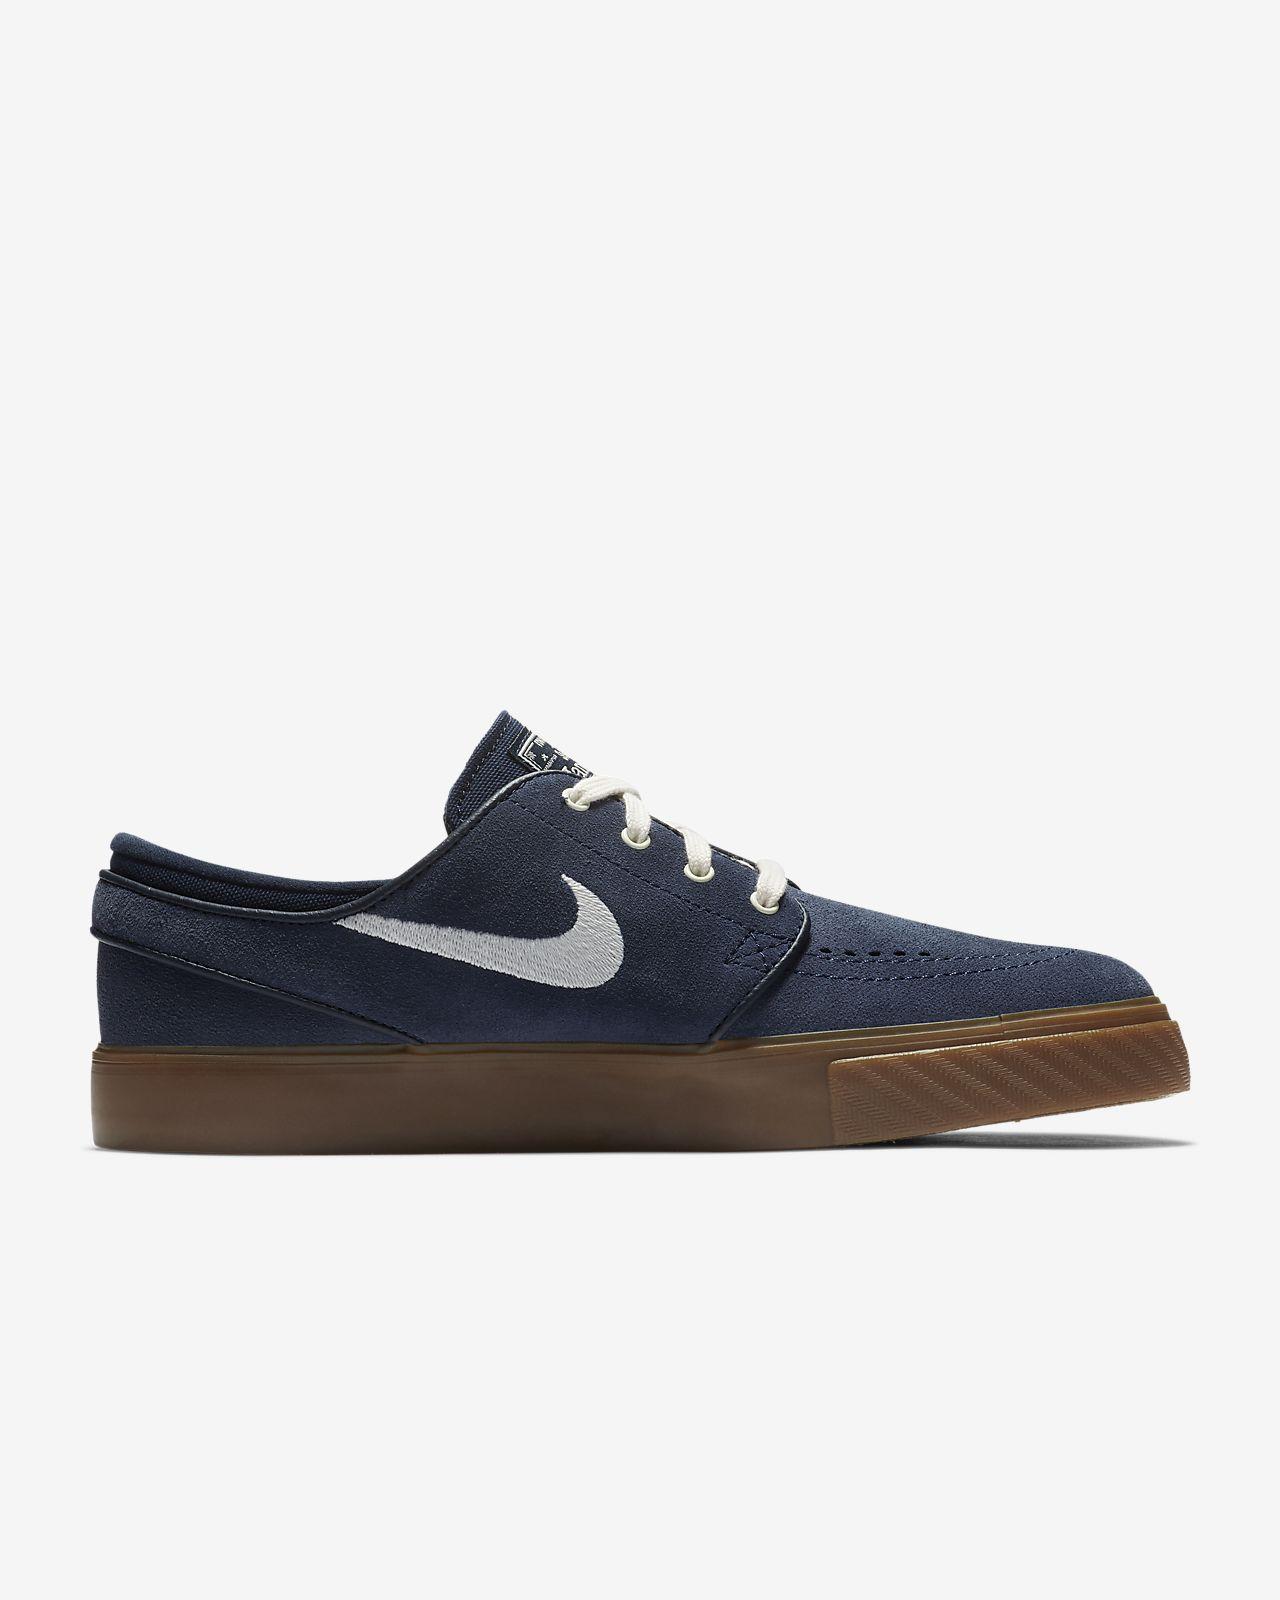 135d0cc35f0 Calzado de skateboarding para mujer Nike Zoom Stefan Janoski. Nike ...